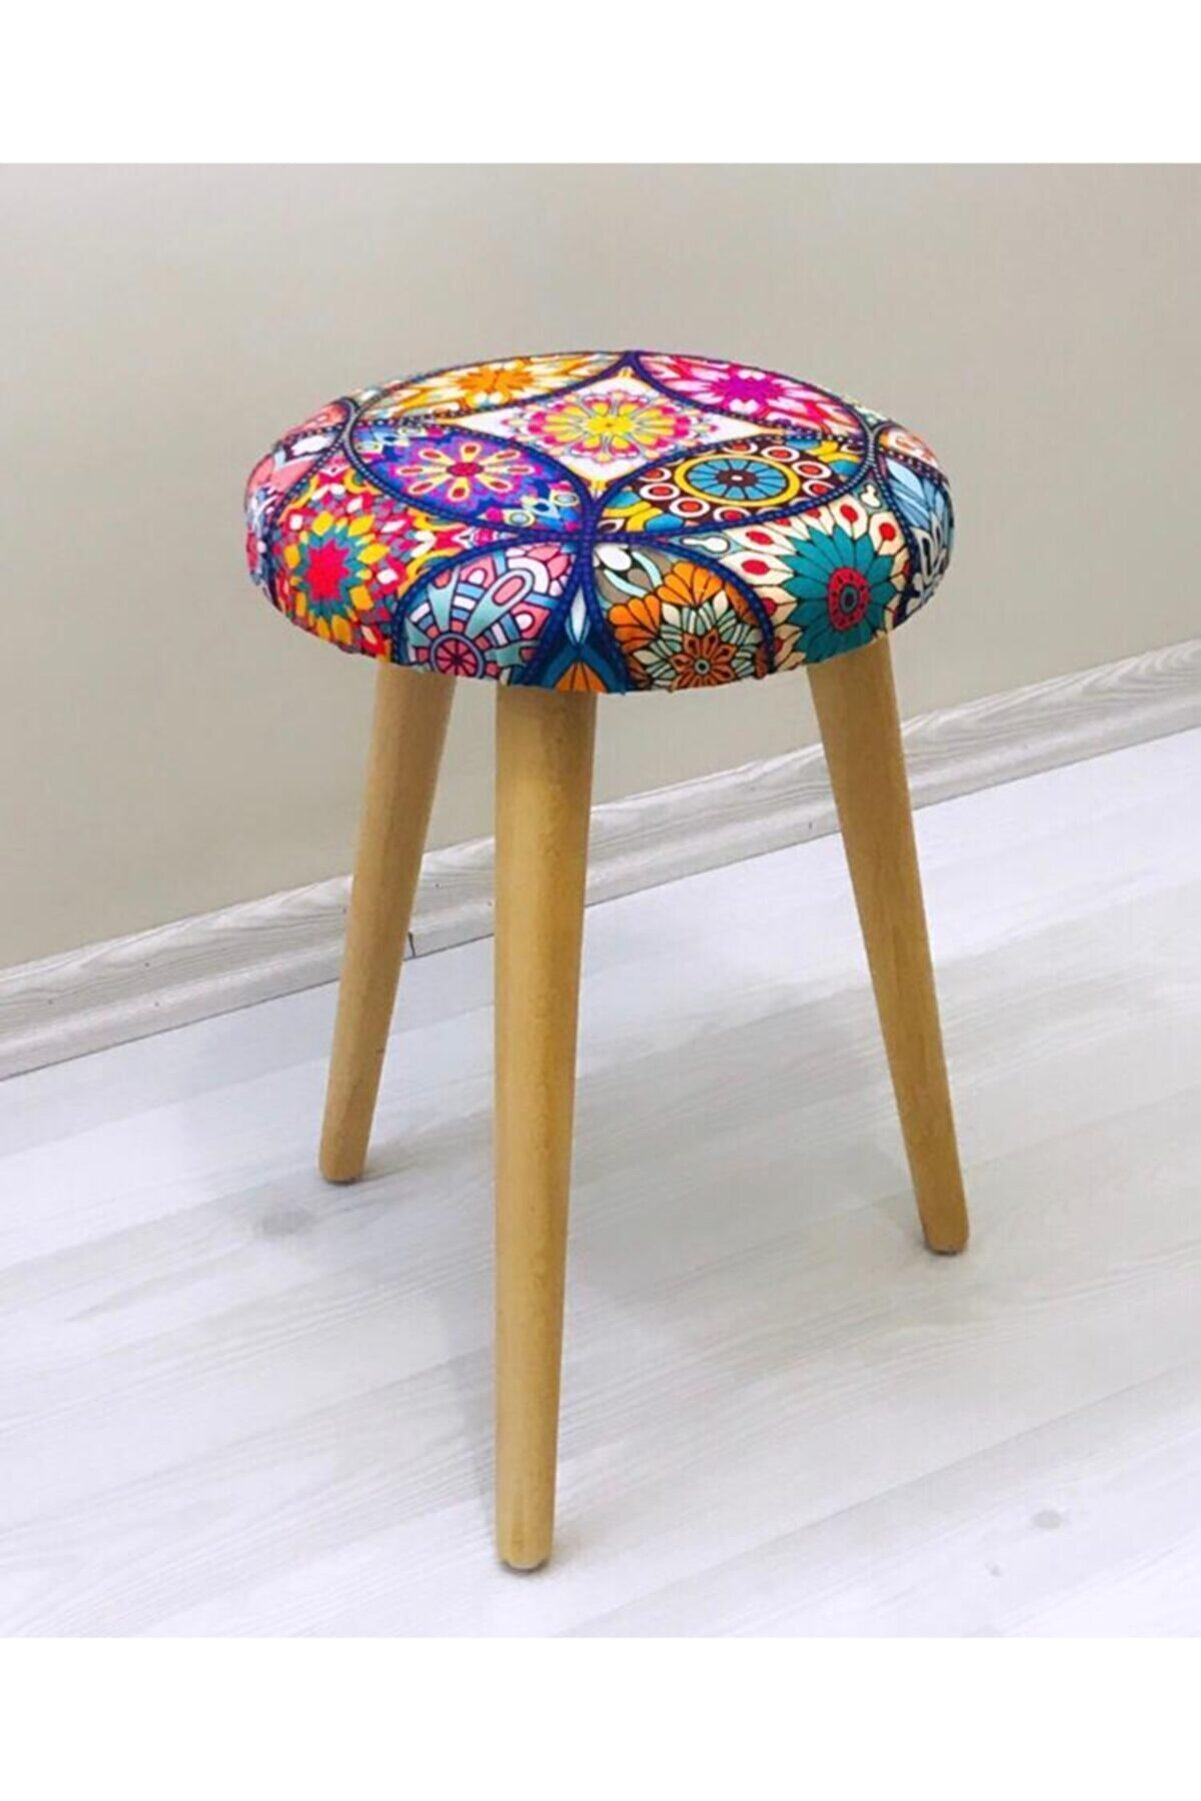 WEBPANYA Ahşap Ayak Dekoratif Etnik Desenli Puf Tabure Bench Yuvarlak Koltuk Sandalye